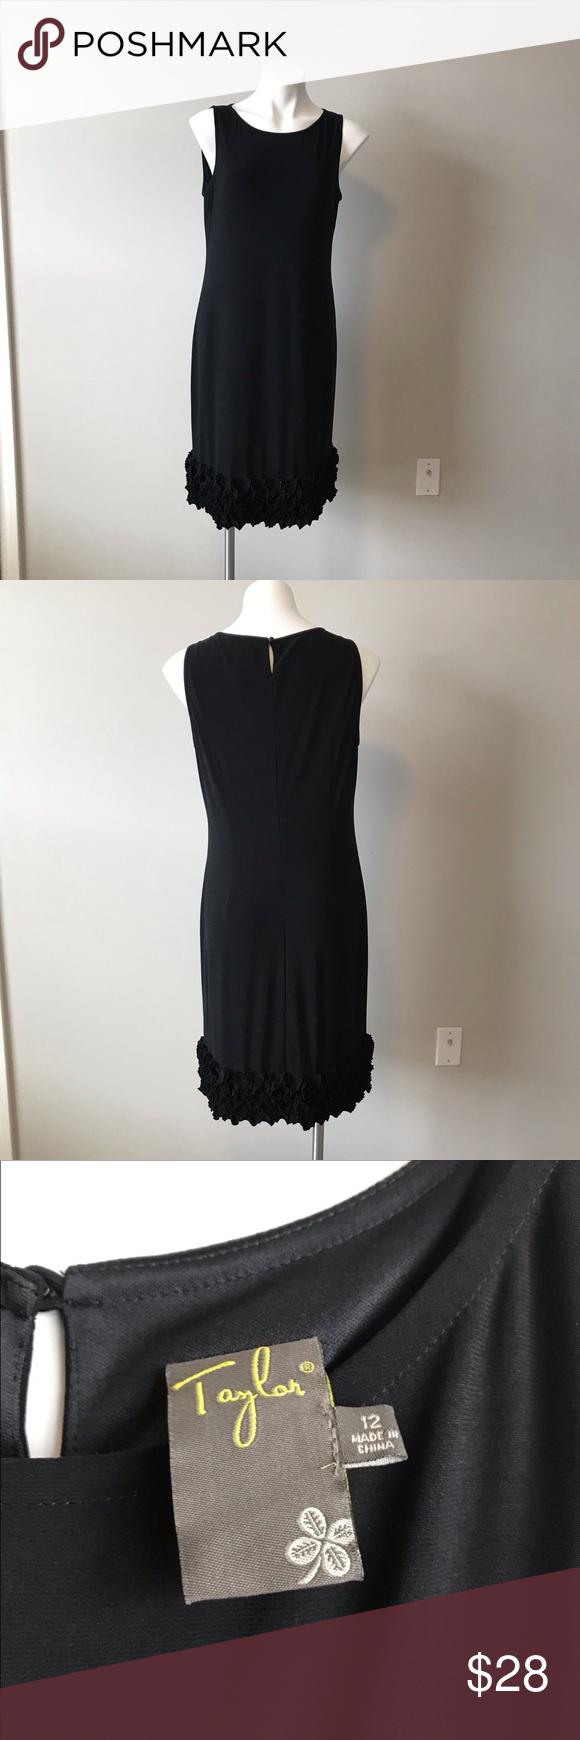 Taylor Black Dress Size 12 Black Dress Taylor Dress Clothes Design [ 1740 x 580 Pixel ]